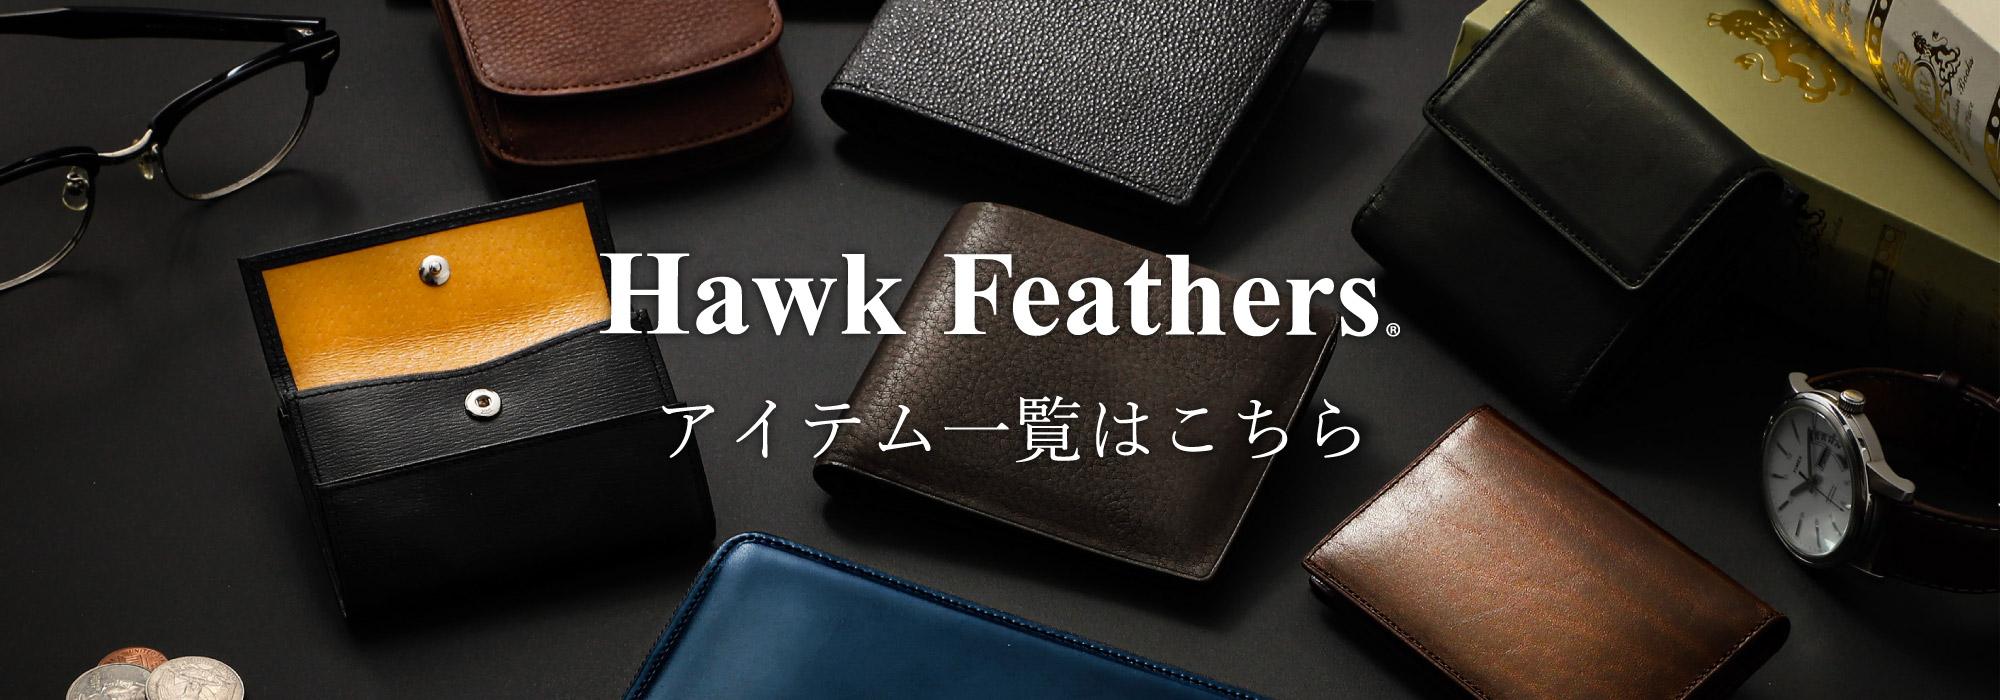 HawkFeathers製品一覧